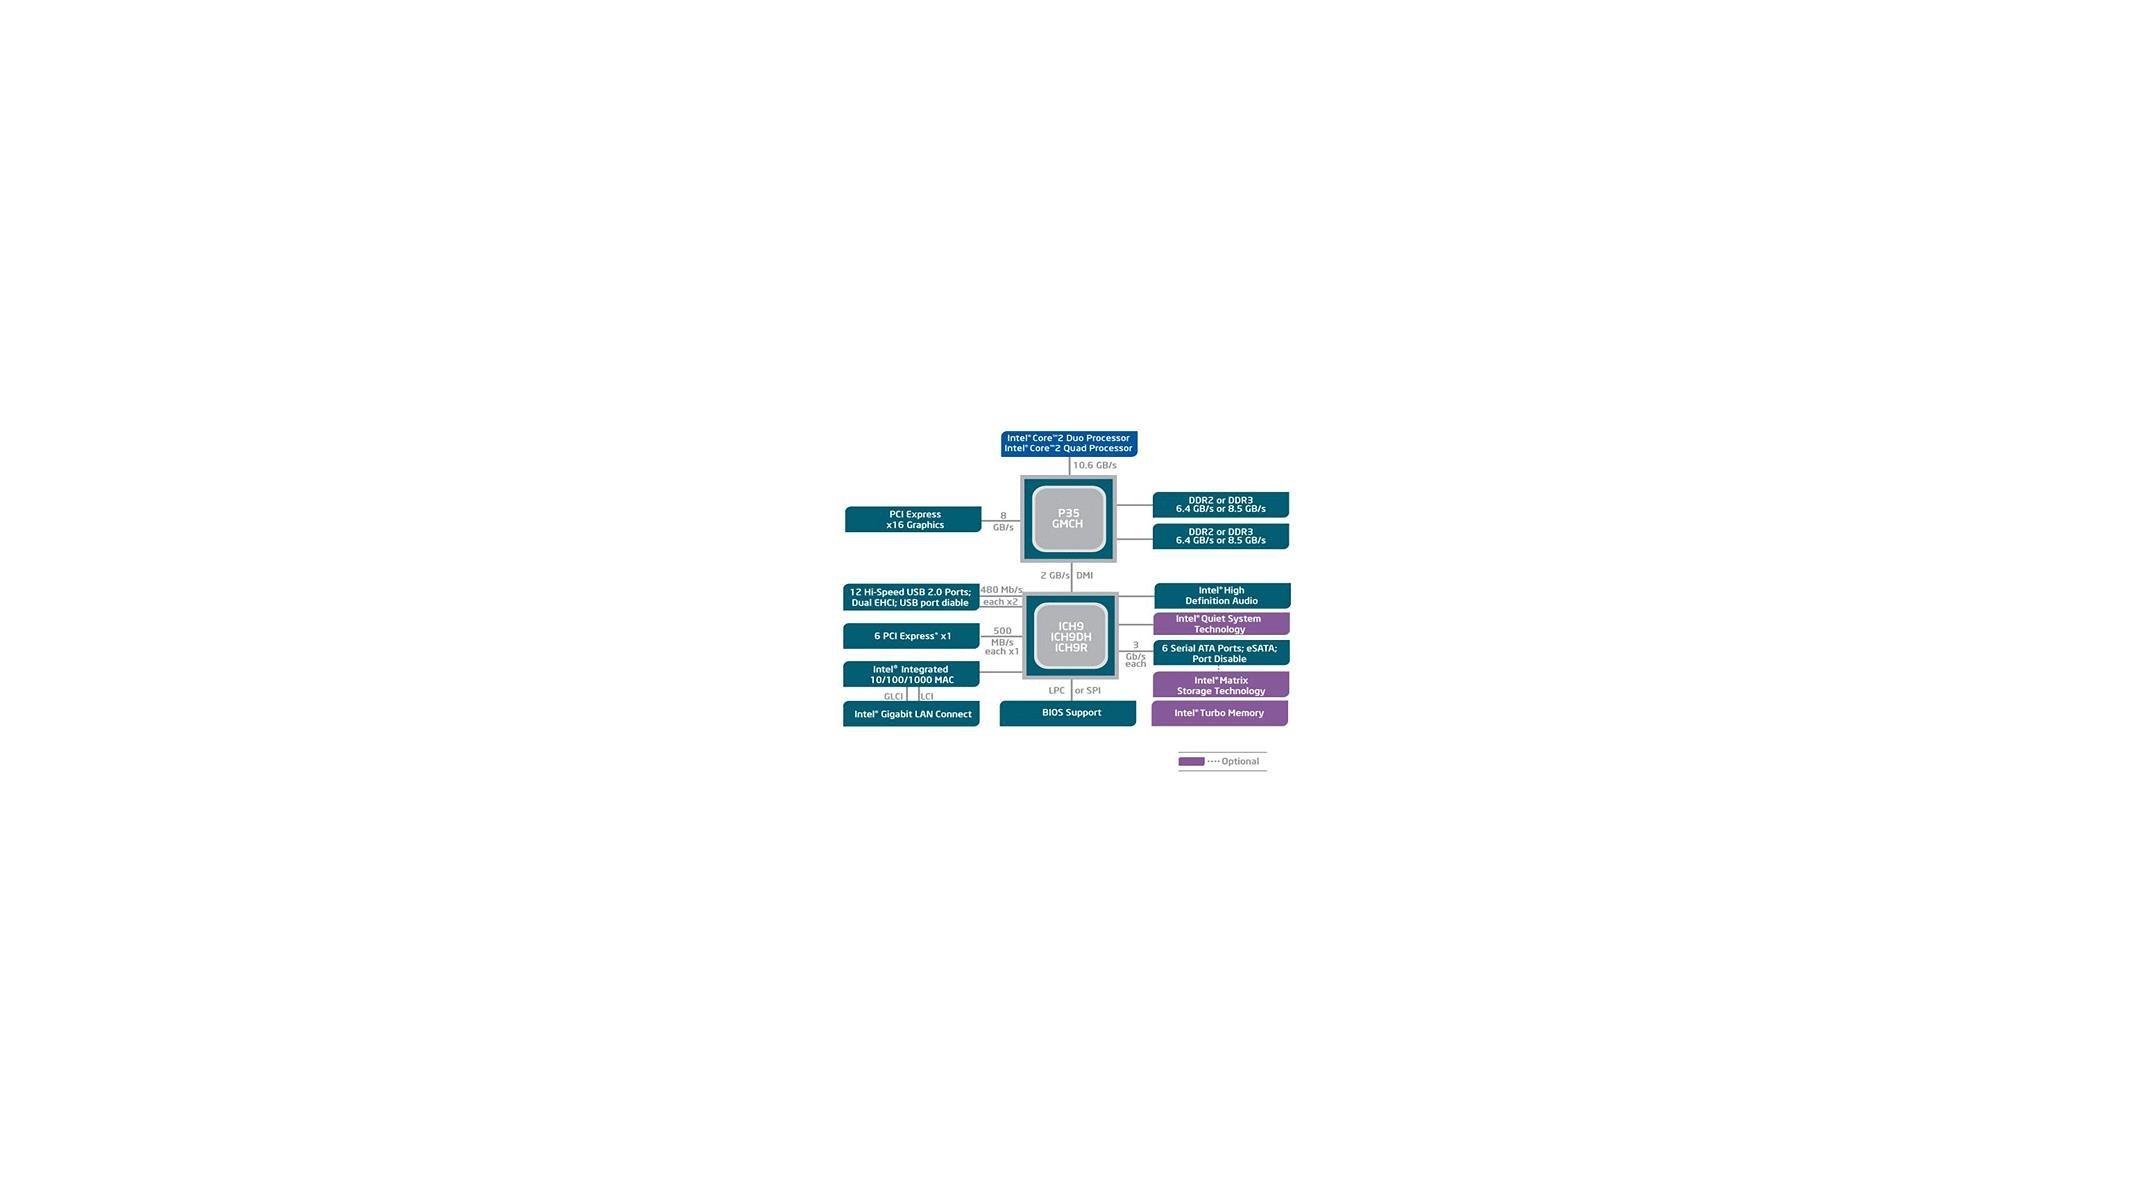 Intel P35 Bearlake Motherboard And DDR3 Memory – Asus and